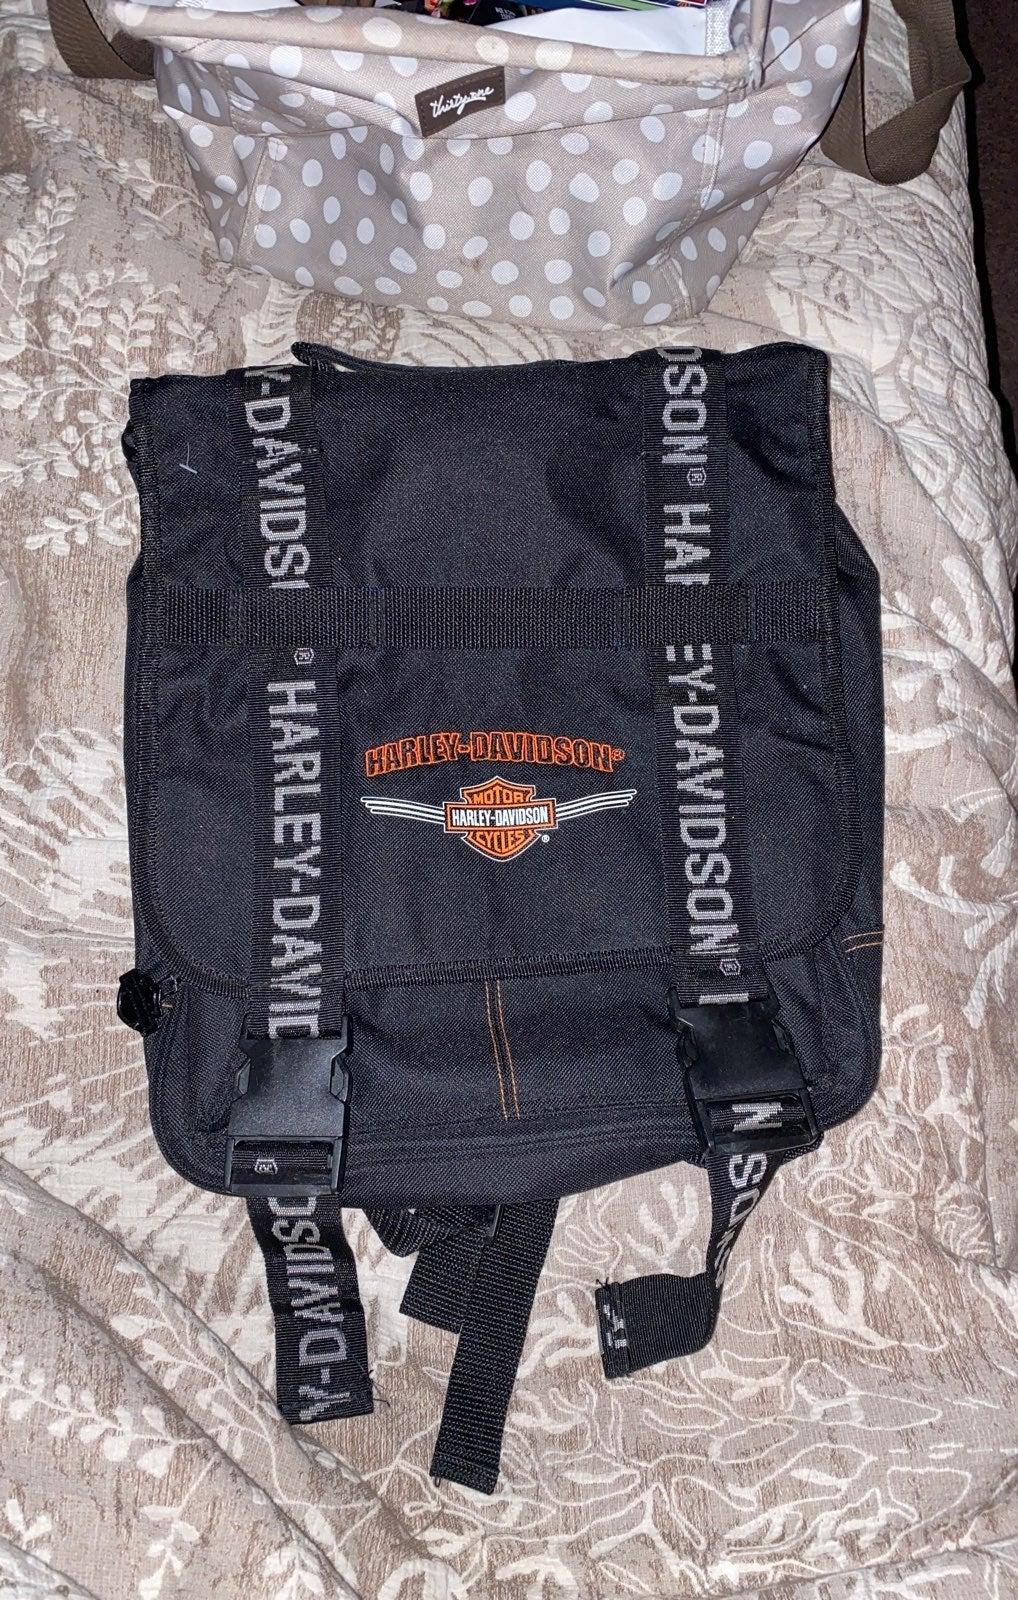 Harley Davidson Backpack like new